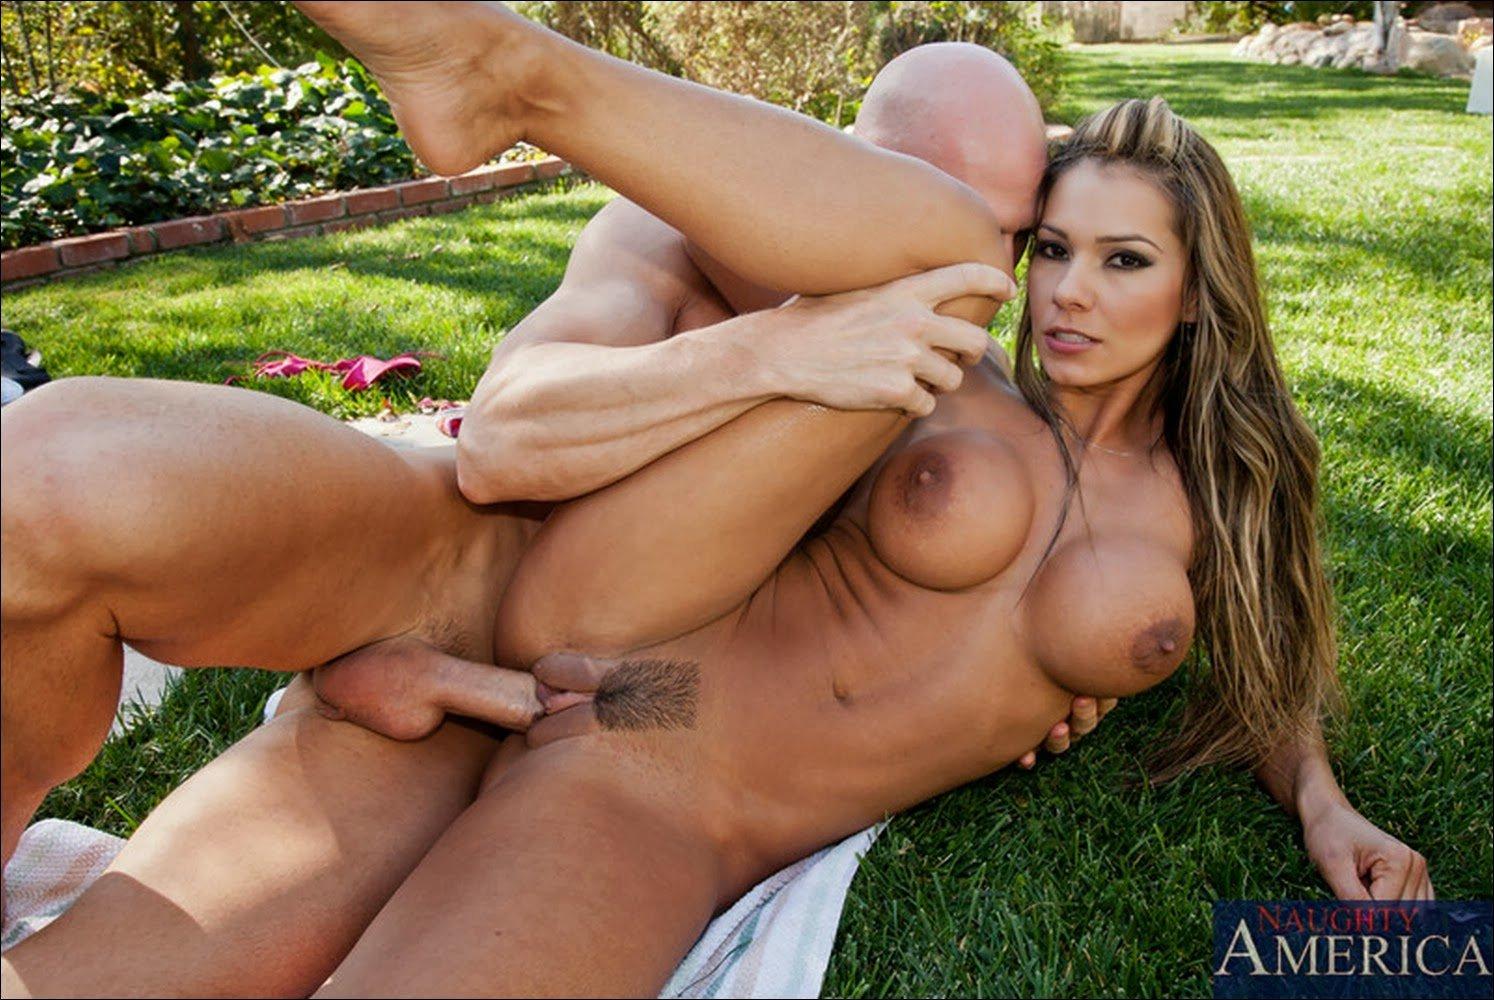 Hot usa porn best american pics